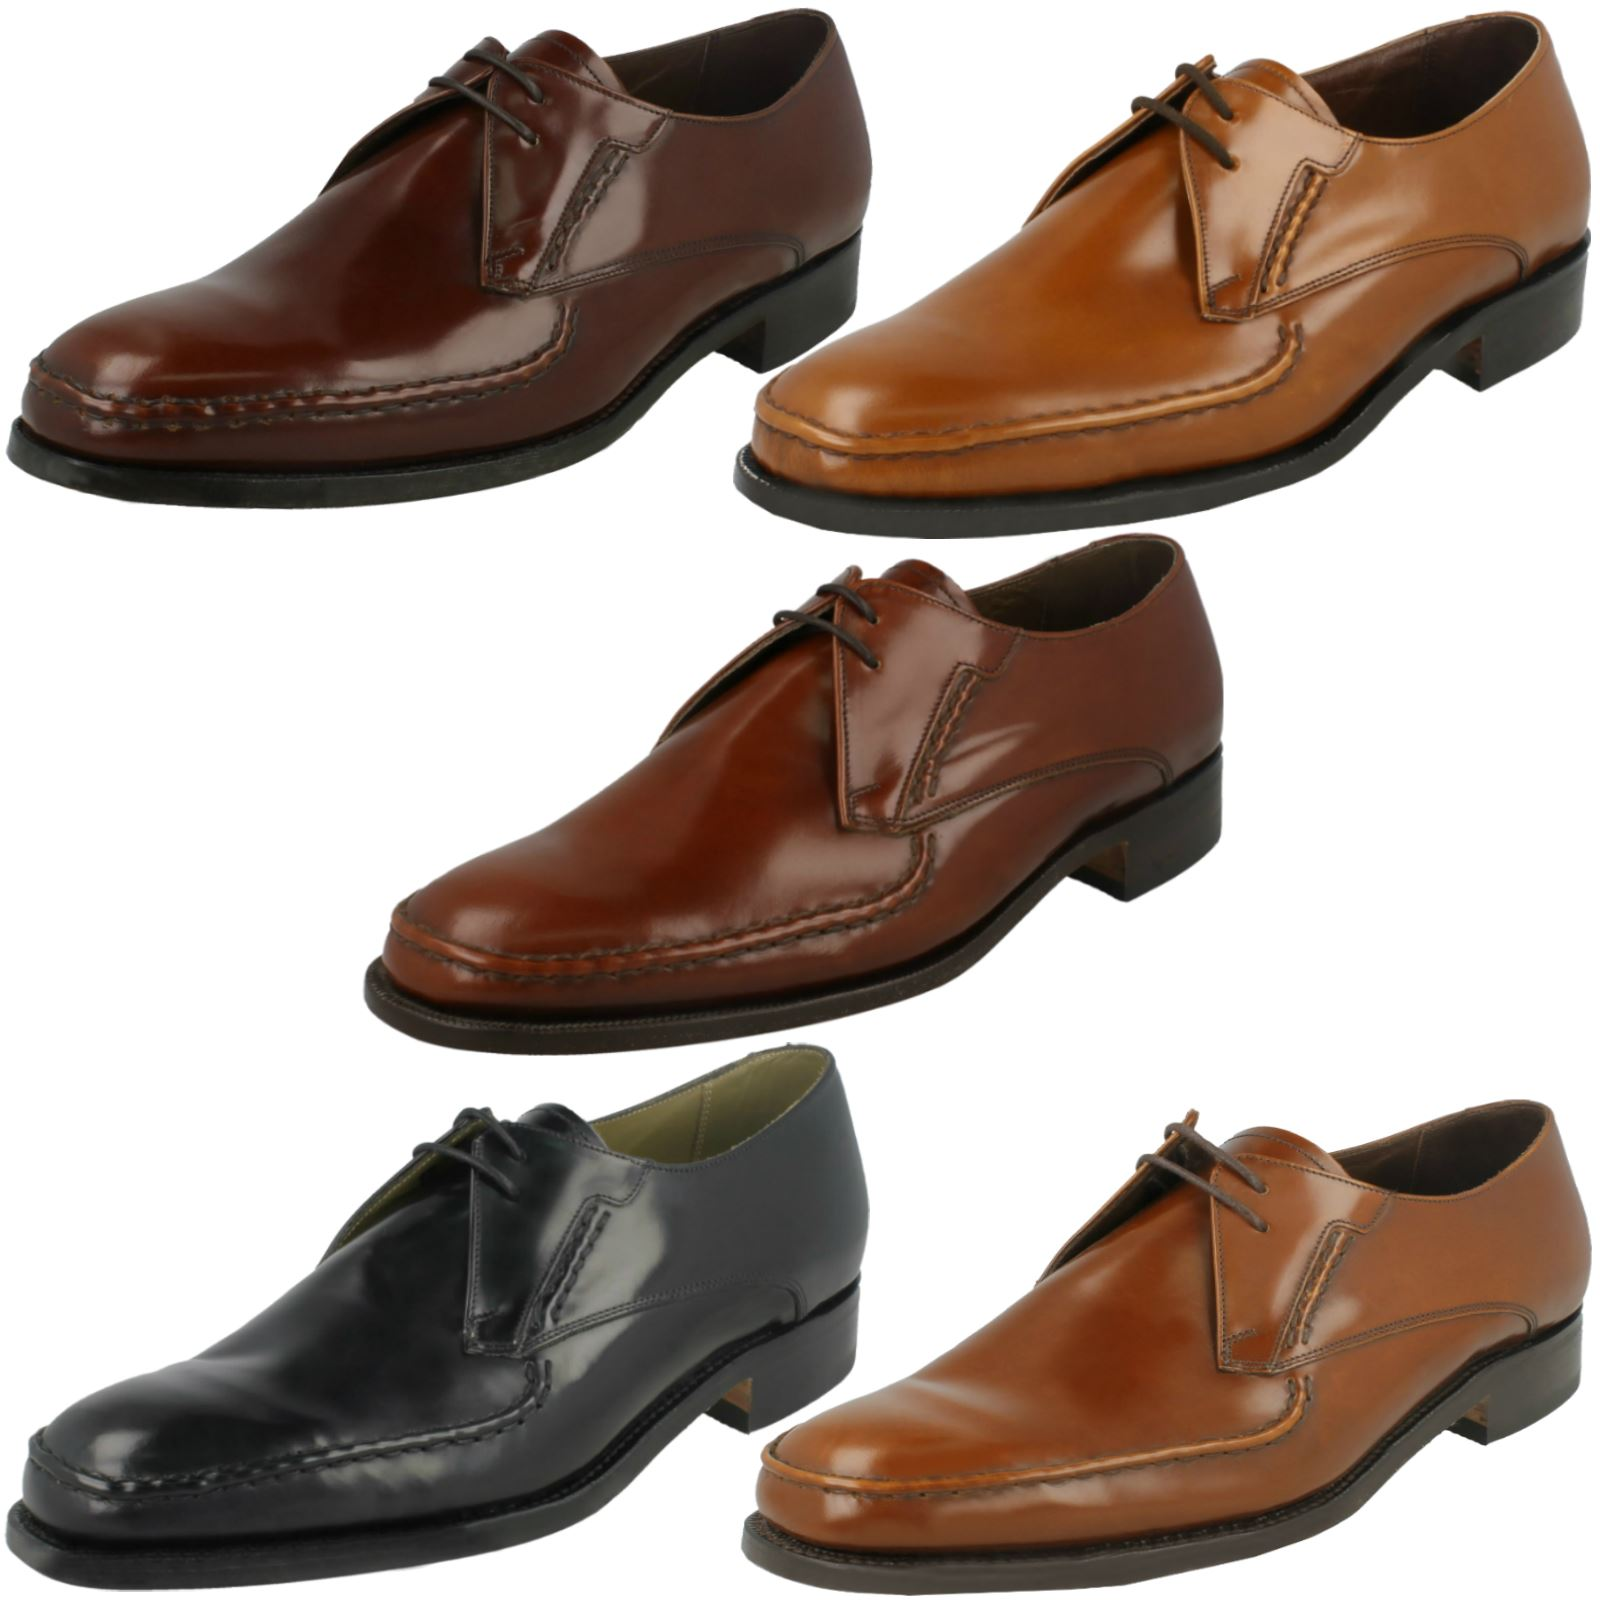 5bb9a732 Barker Mens Formal Shoes Pitney | eBay